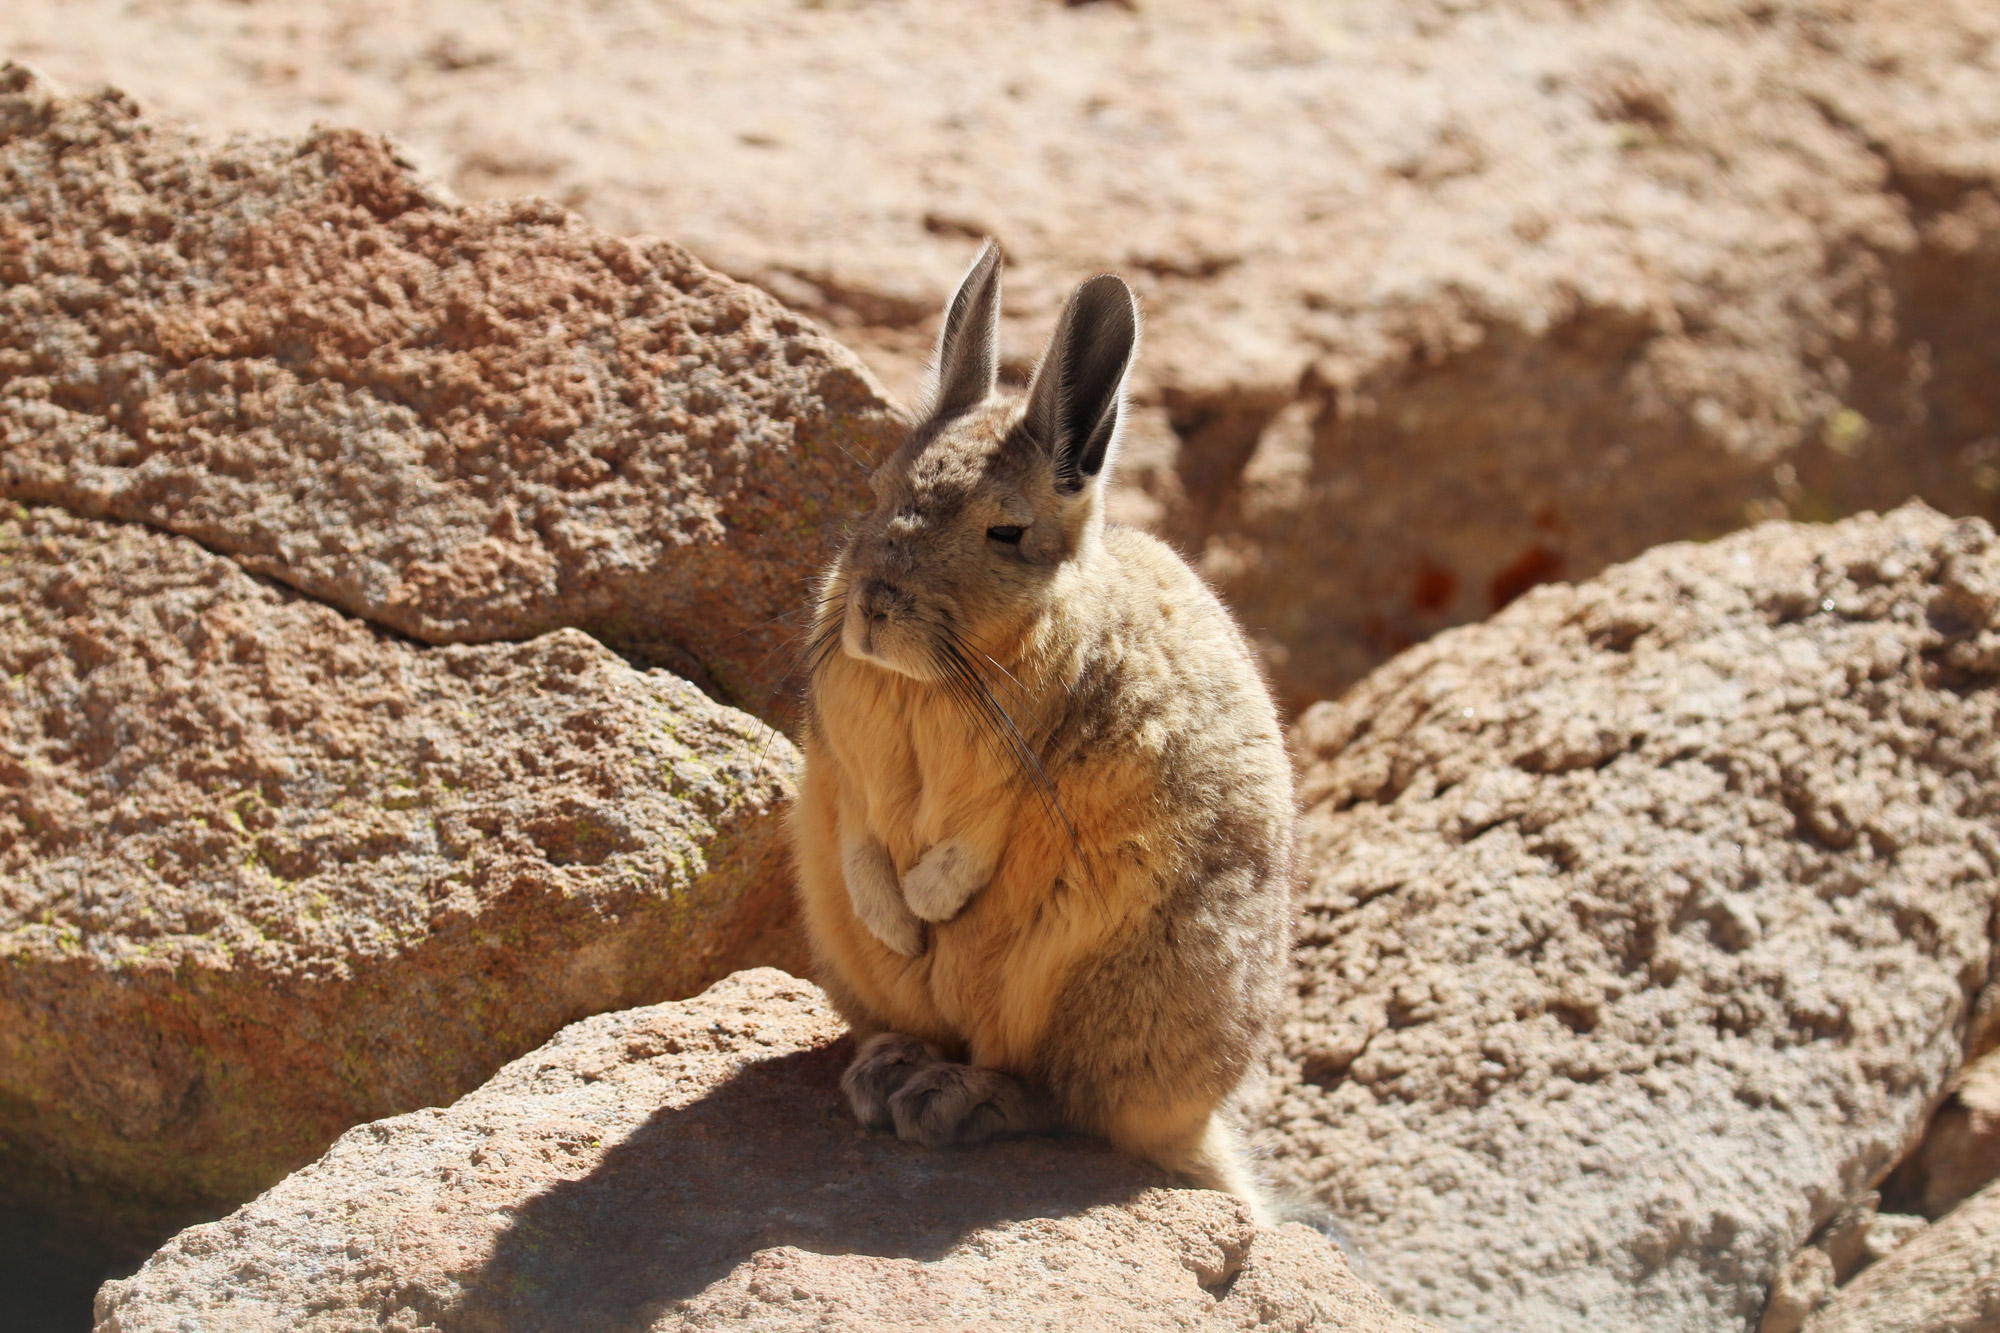 Reisverslag Bolivia: 's wereld grootste zoutvlakte - Cuvierhaasmuis